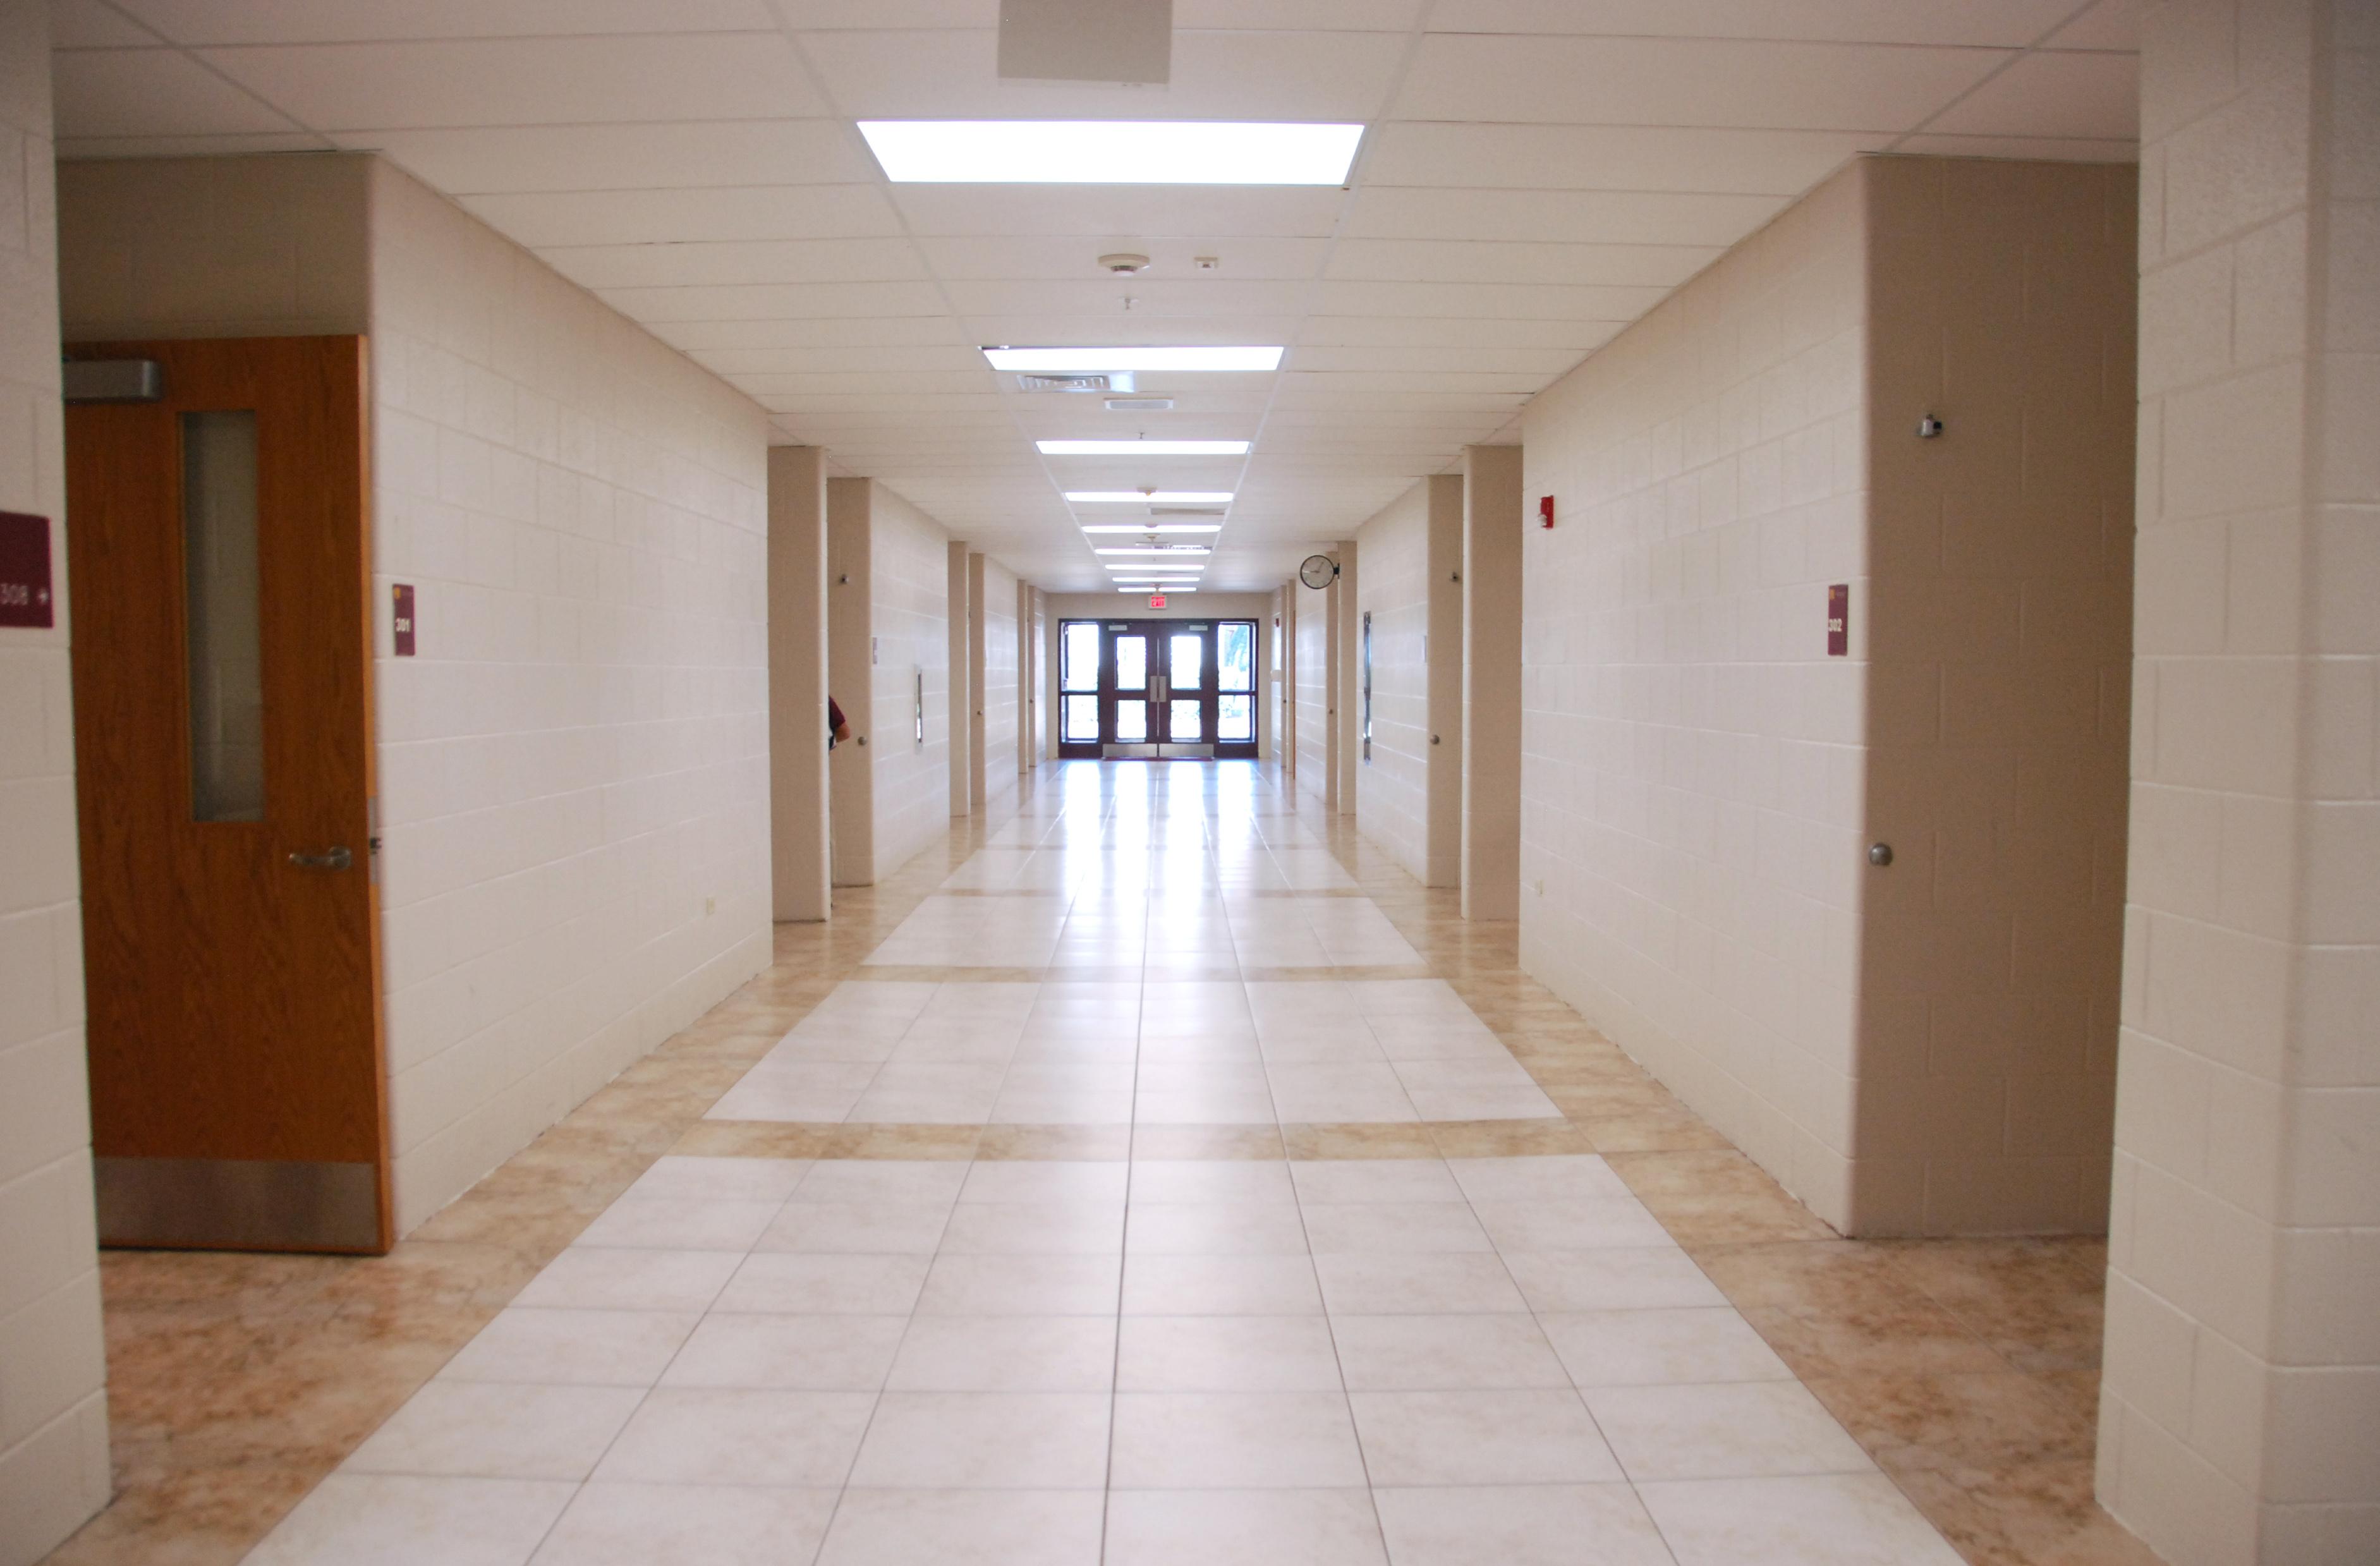 Corridor Design: File:300 Corridor, Inside.jpg